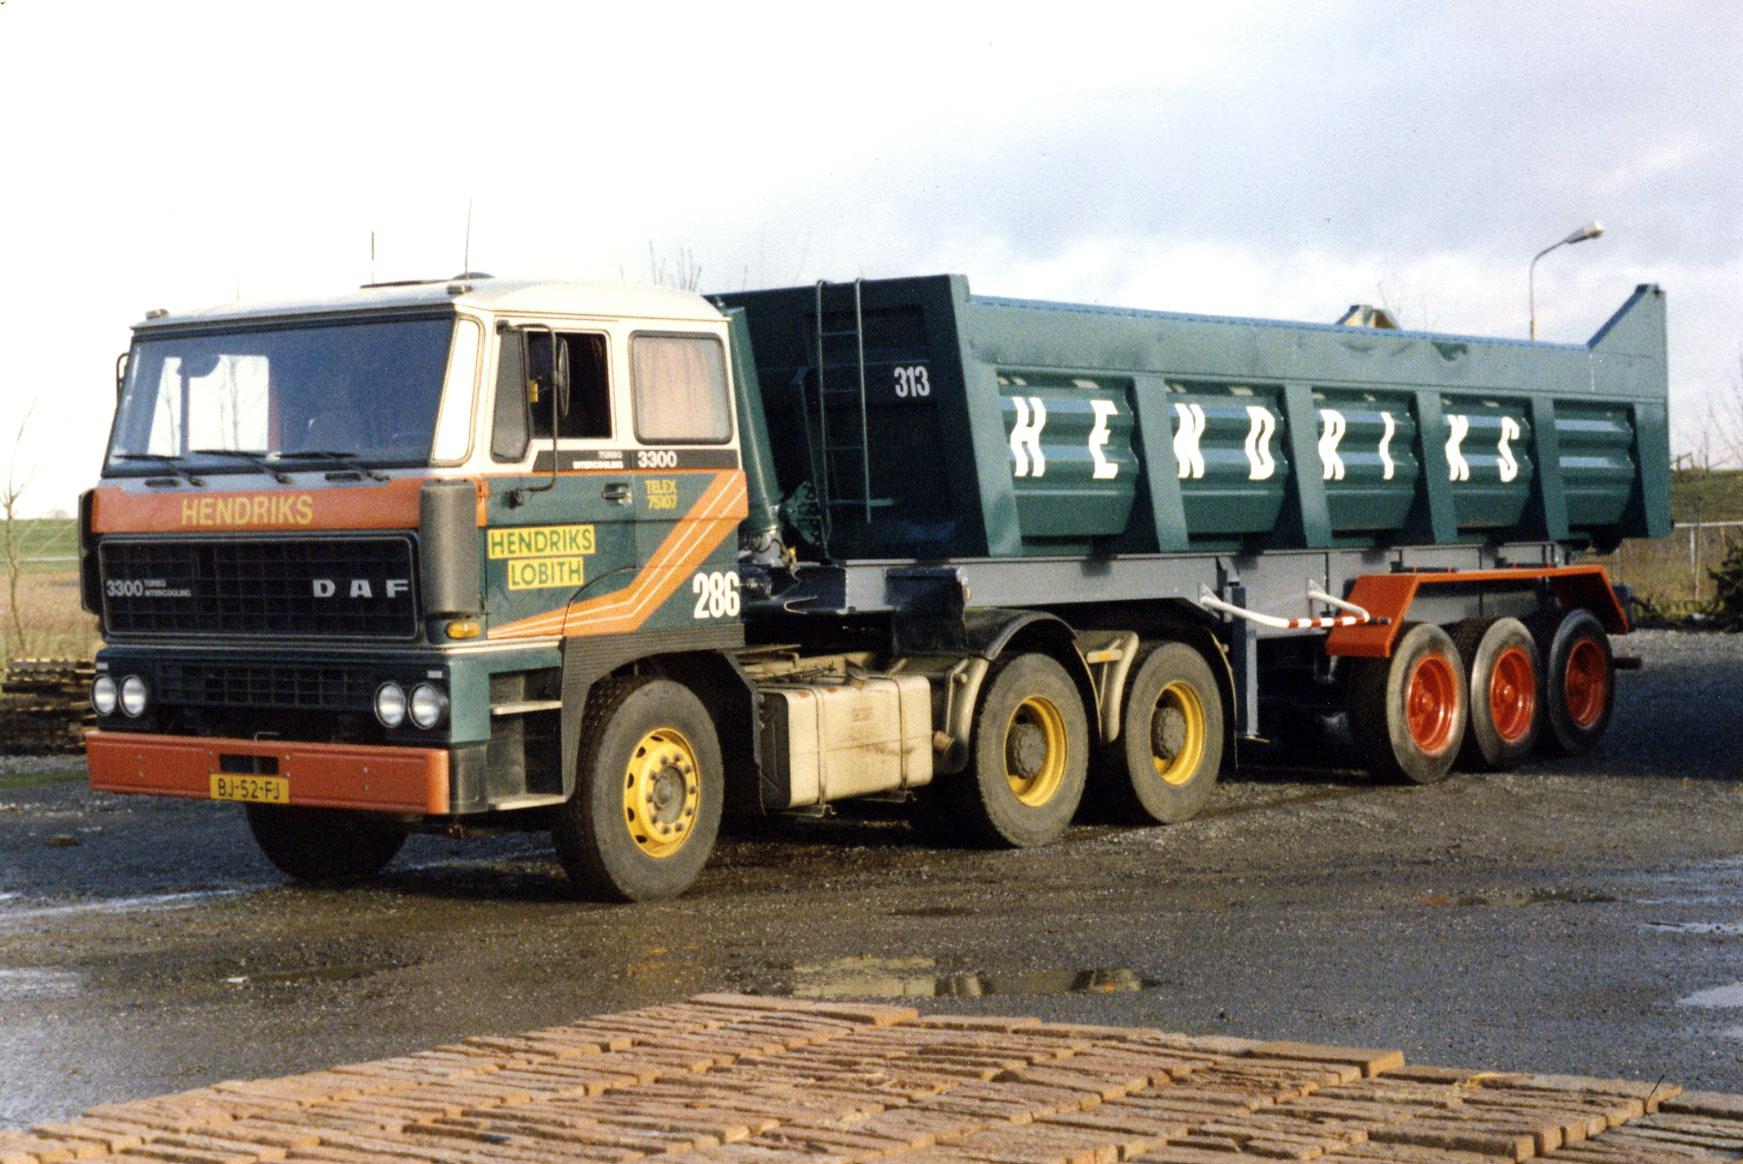 Hendriks-Lobith-DAF-FTT3300-BJ52FJ-2